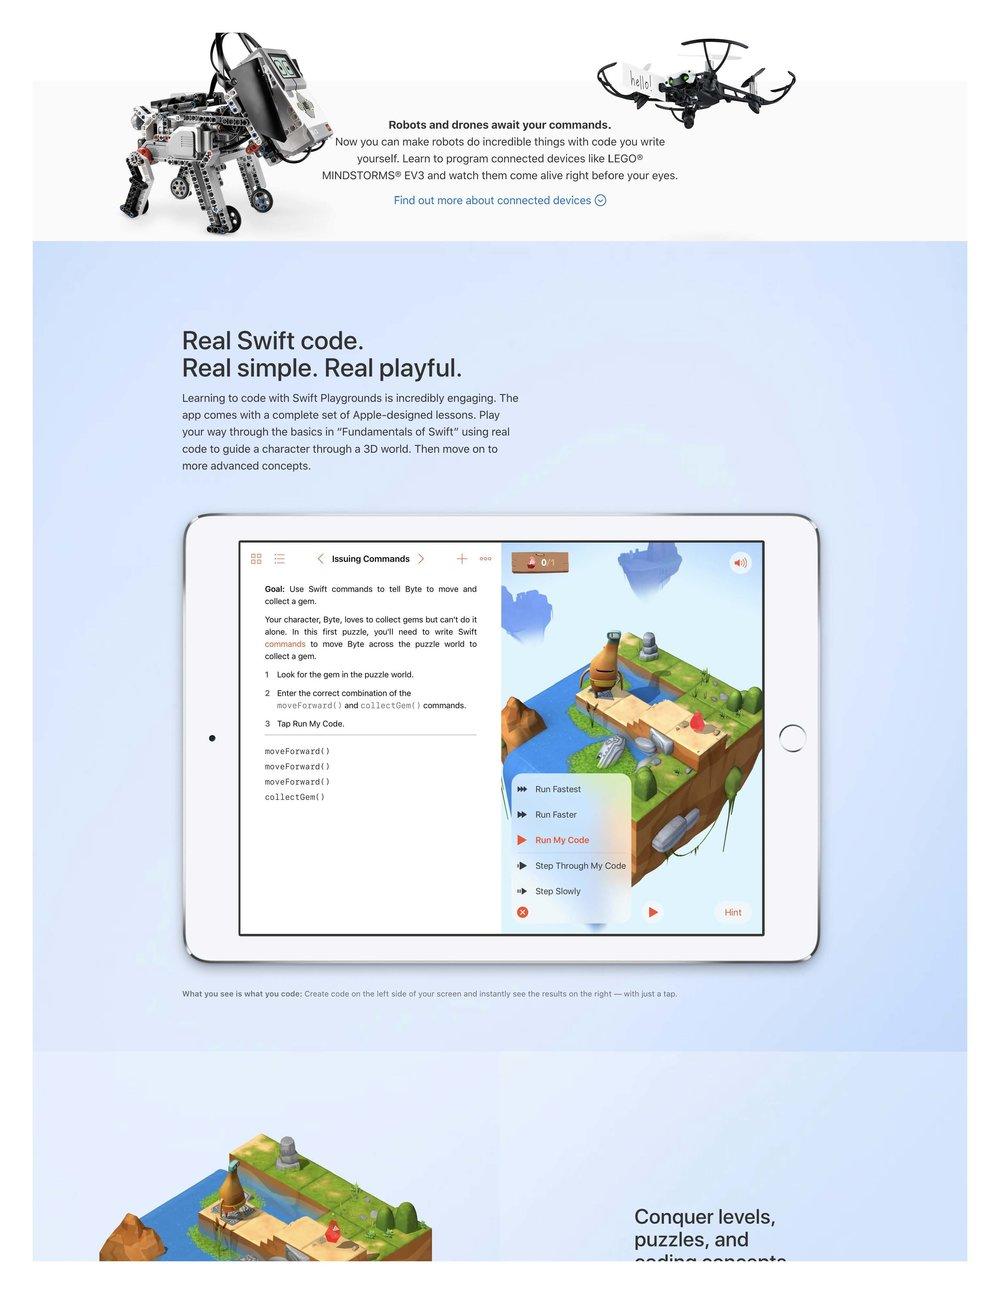 screencapture-apple-swift-playgrounds-2019-03-10-12_50_37_Page_2.jpg